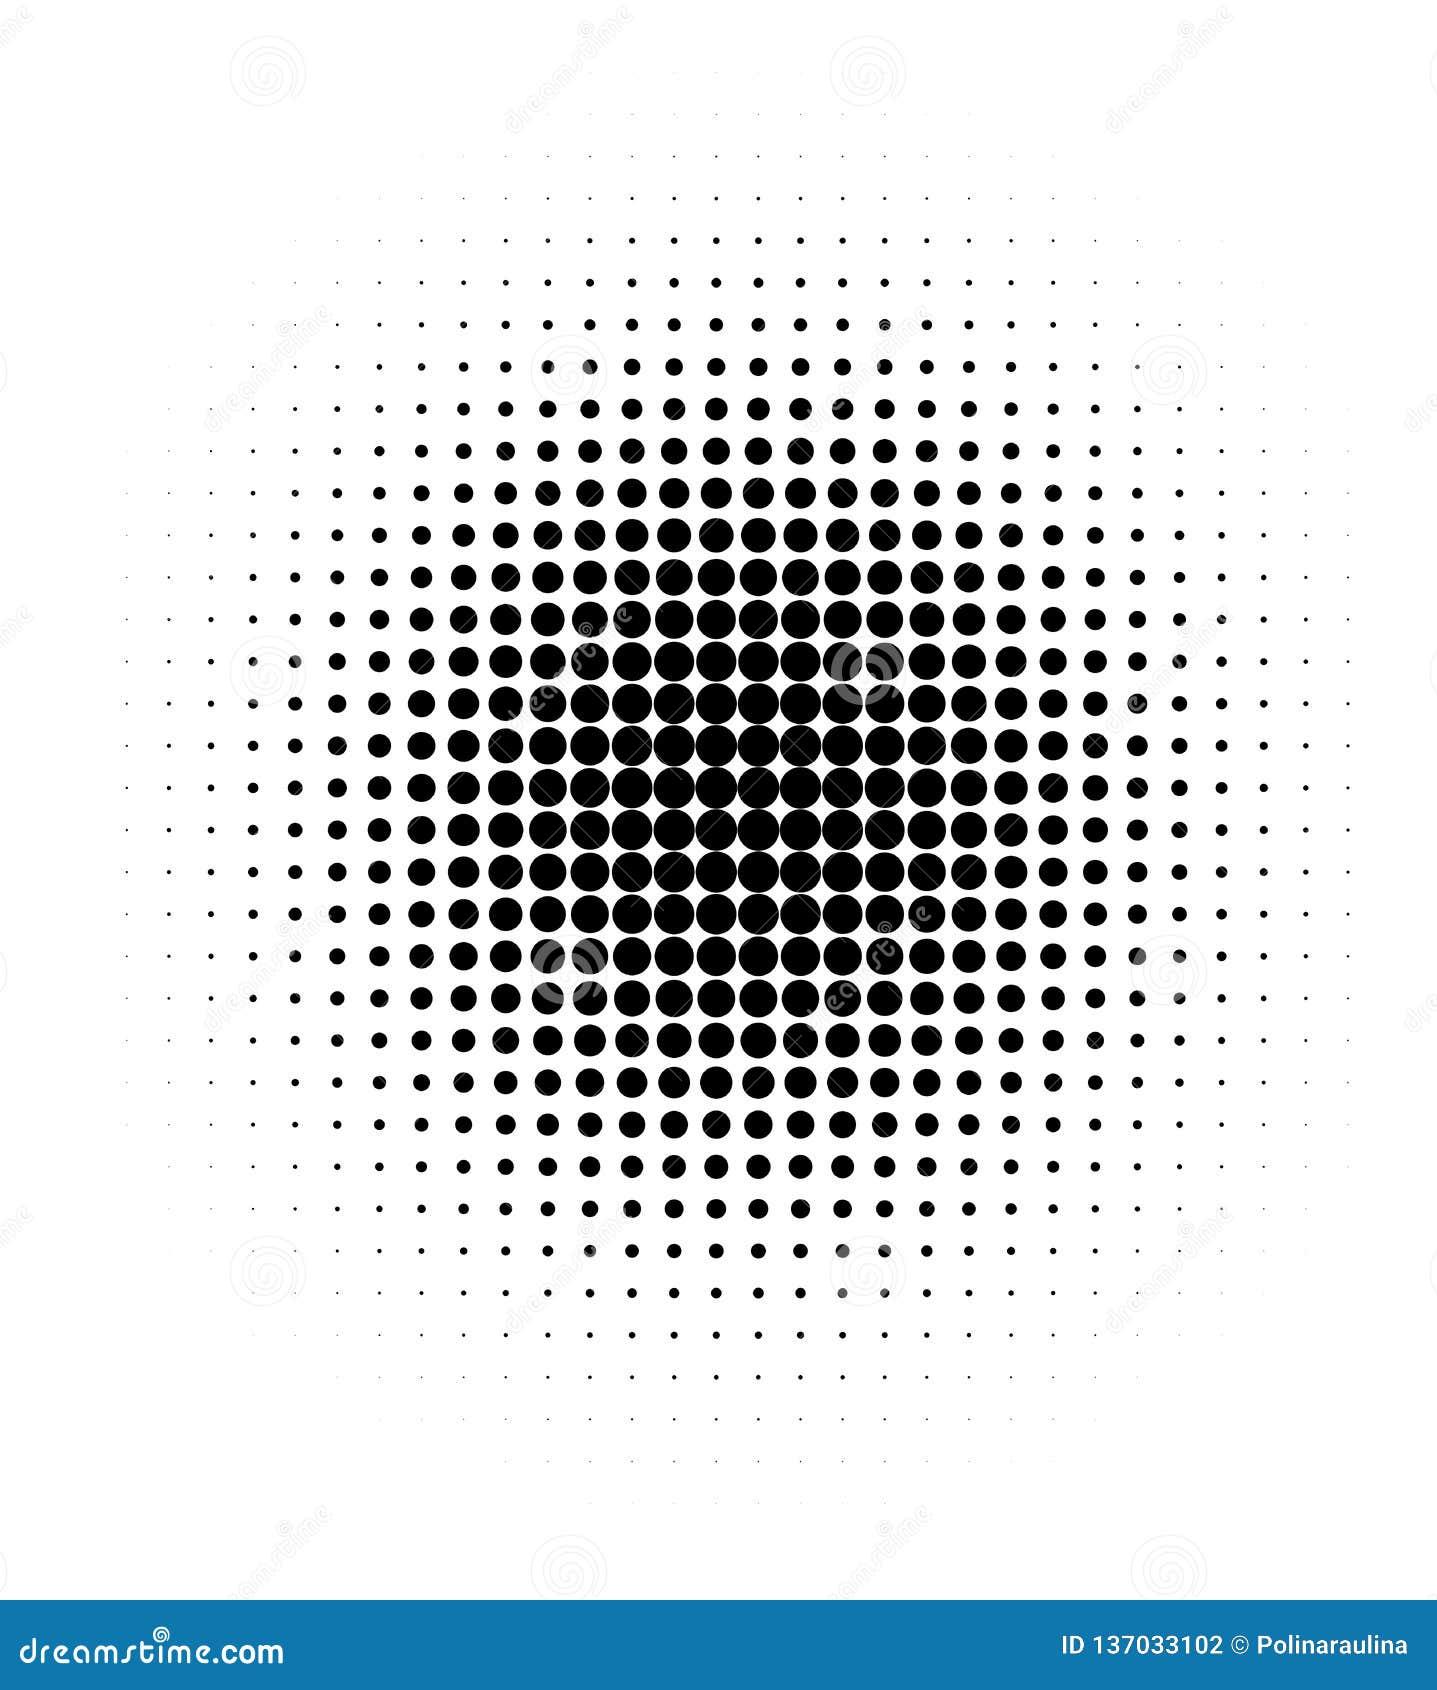 Halftone black dots on white background.